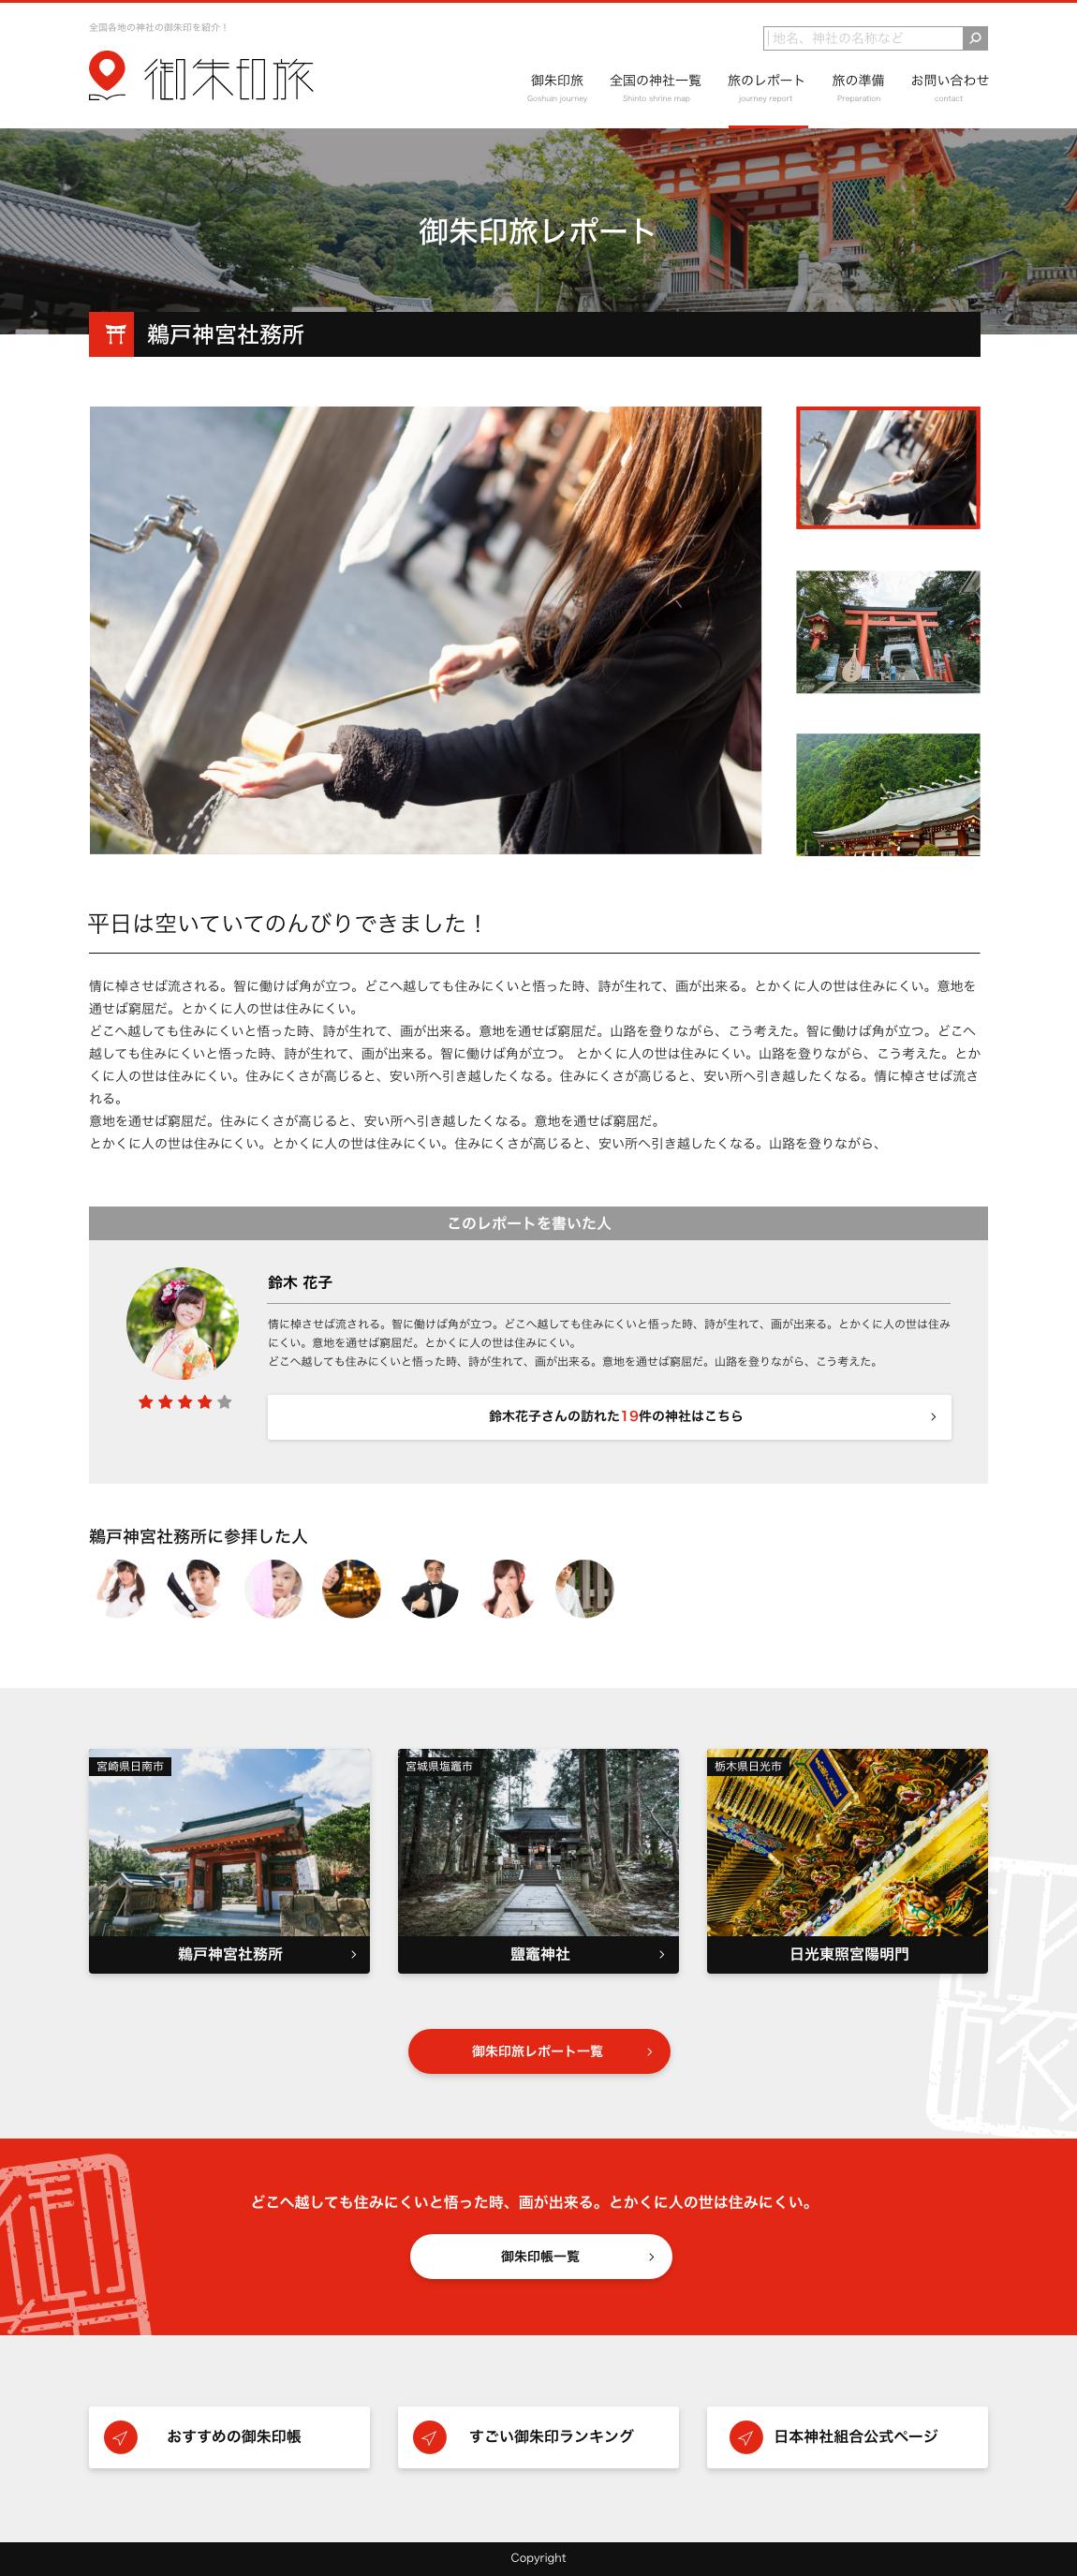 Web design sample 02